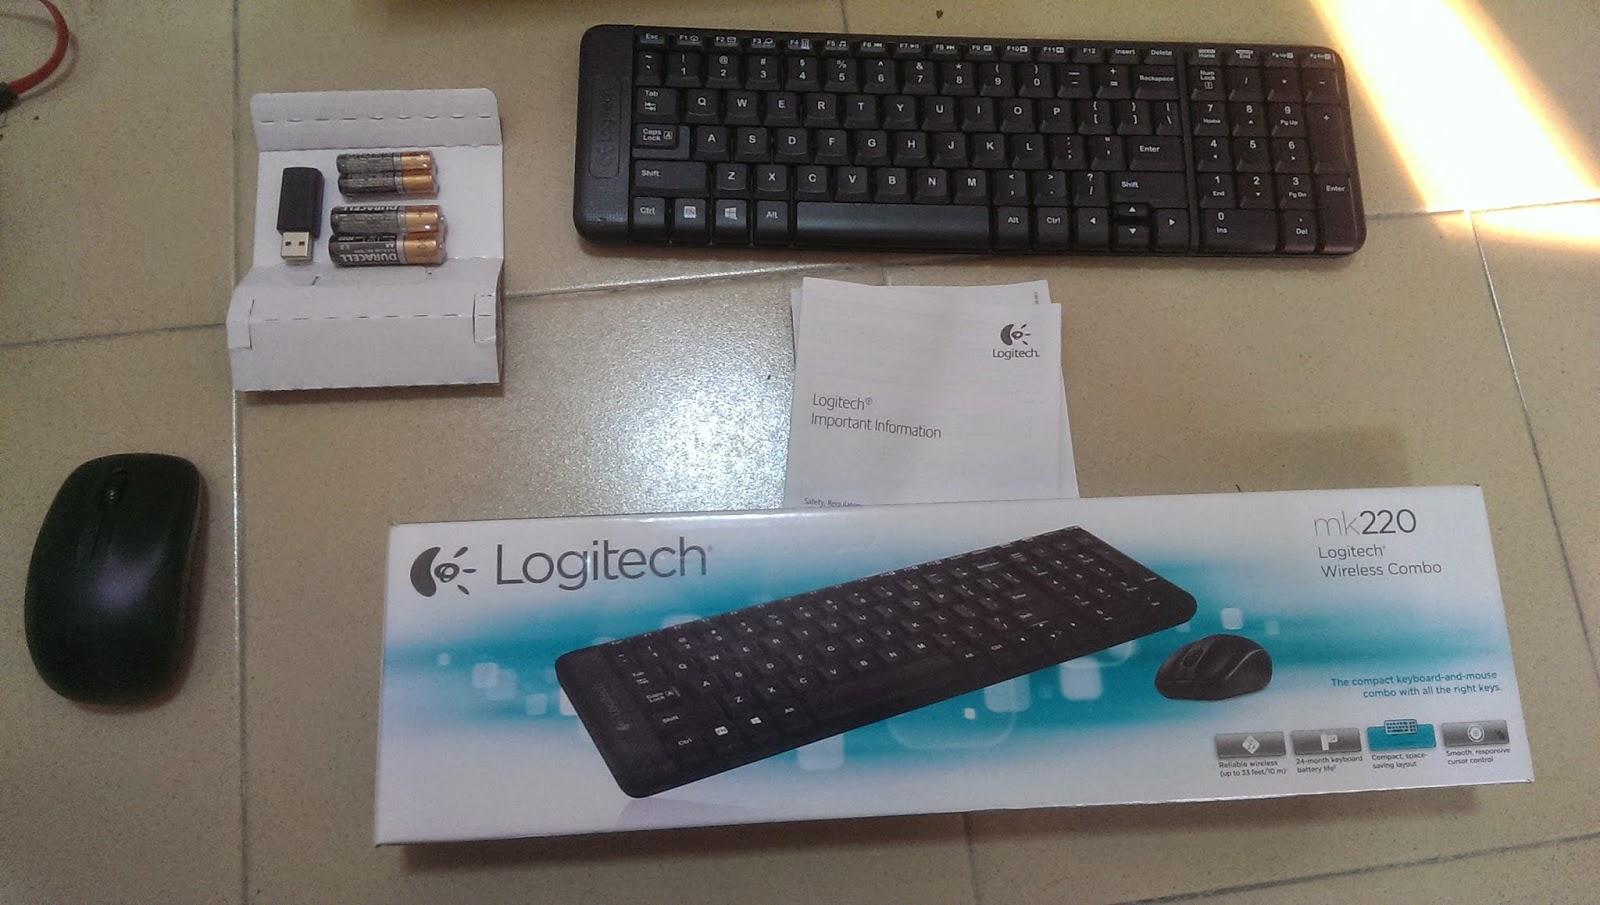 On Ubuntu: Logitech MK220 impressions